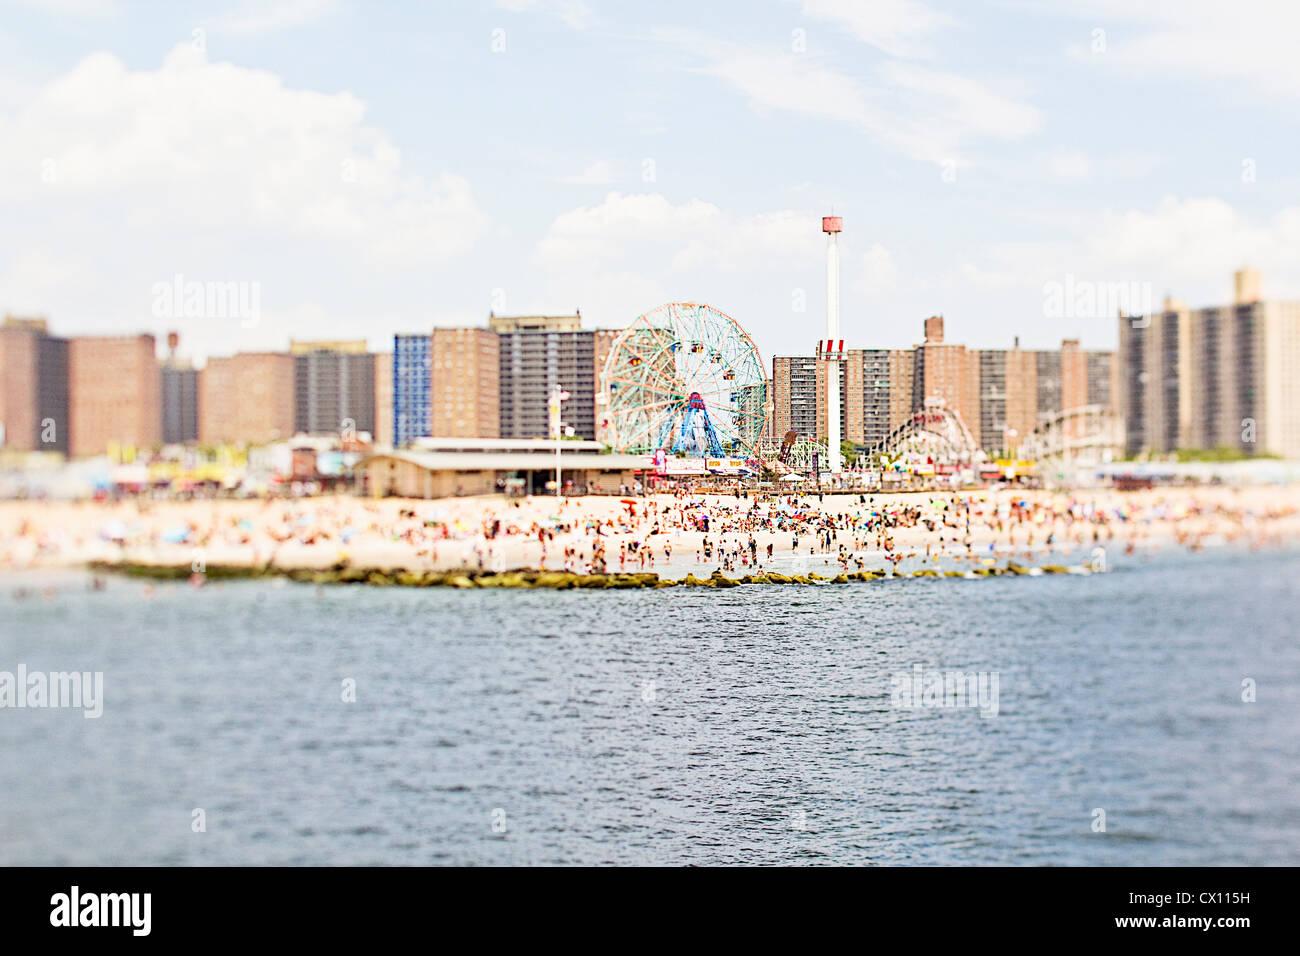 Coney Island beach, Brooklyn, New York, USA - Stock Image